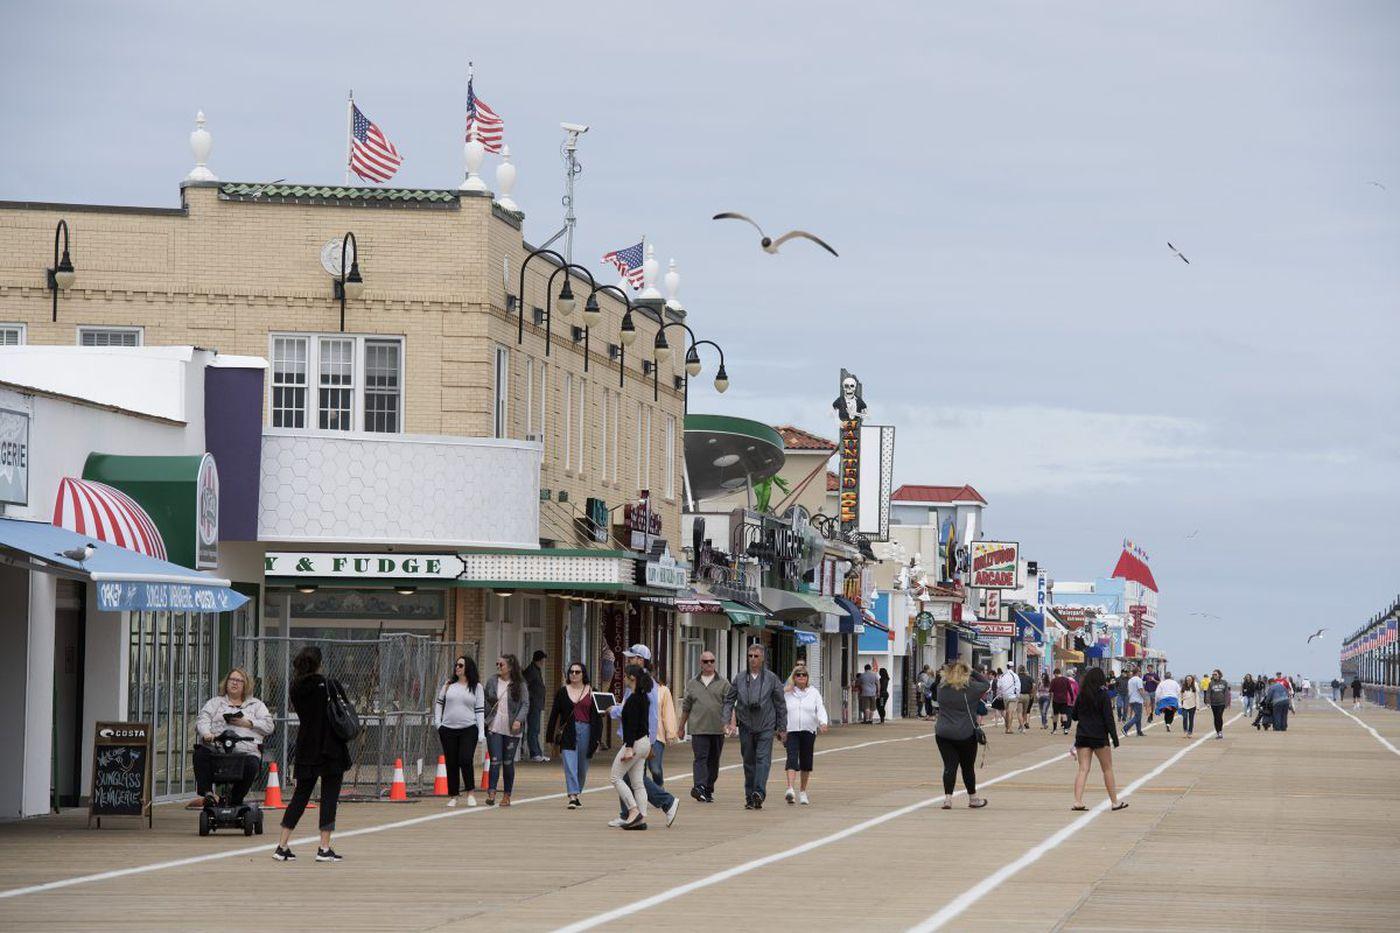 Ocean City officials detail plans for $11.5 million beach rebuilding project, final leg of boardwalk rehab